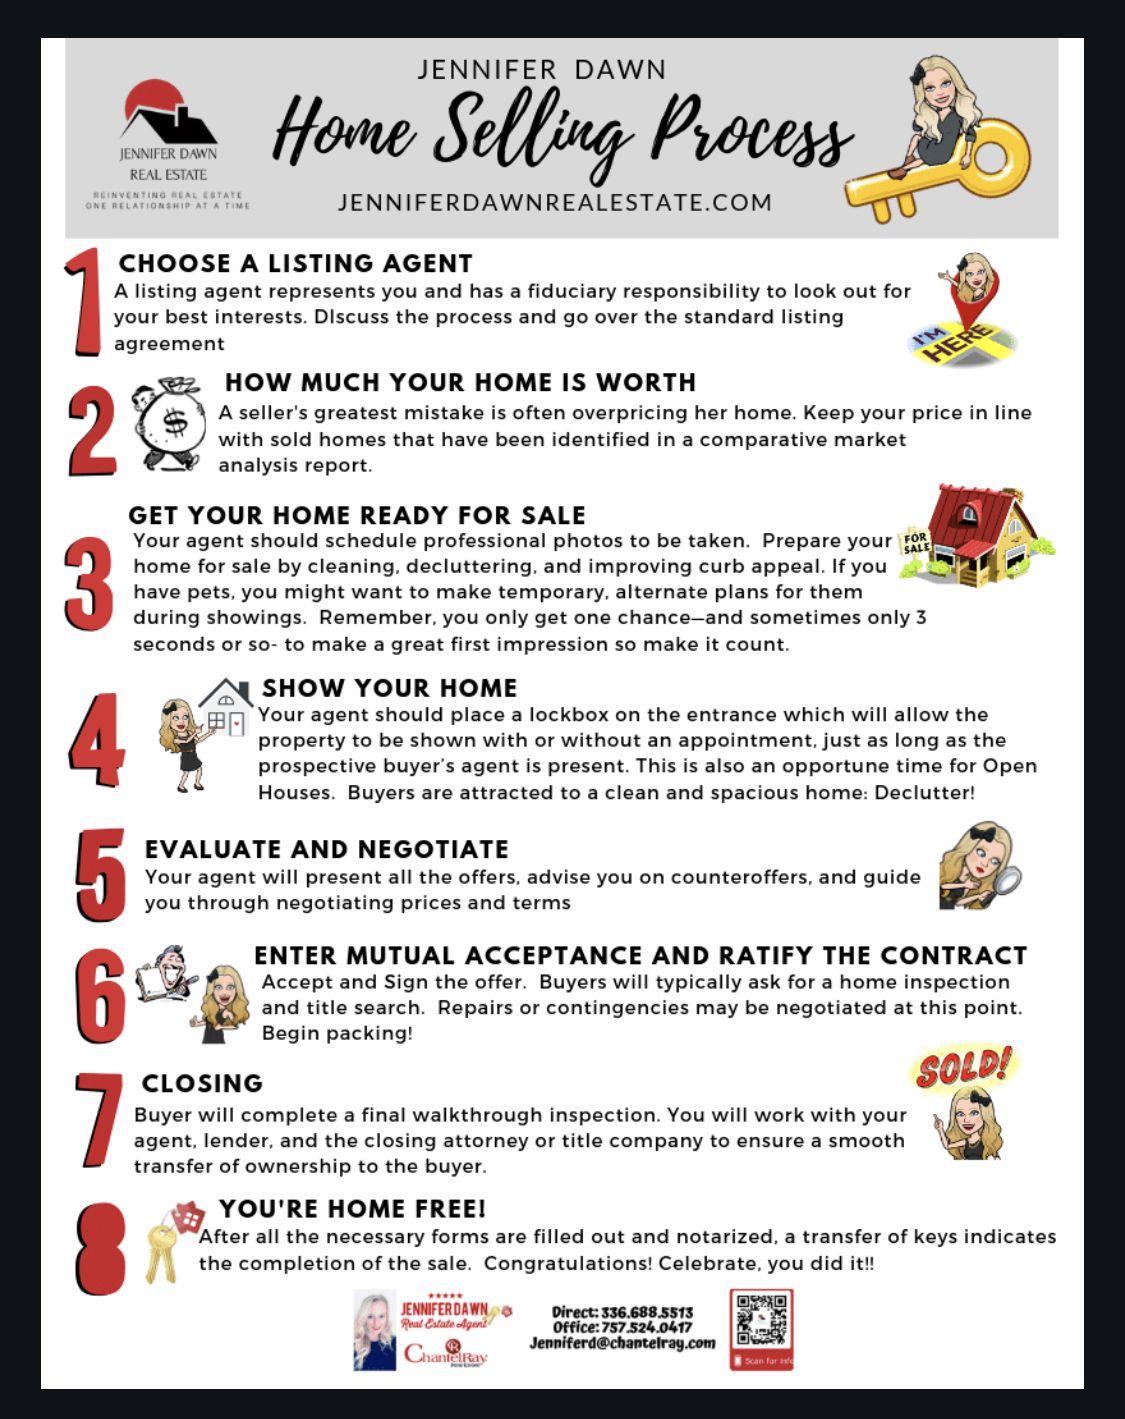 Home Listing Process with Jennifer Dawn Jennifer